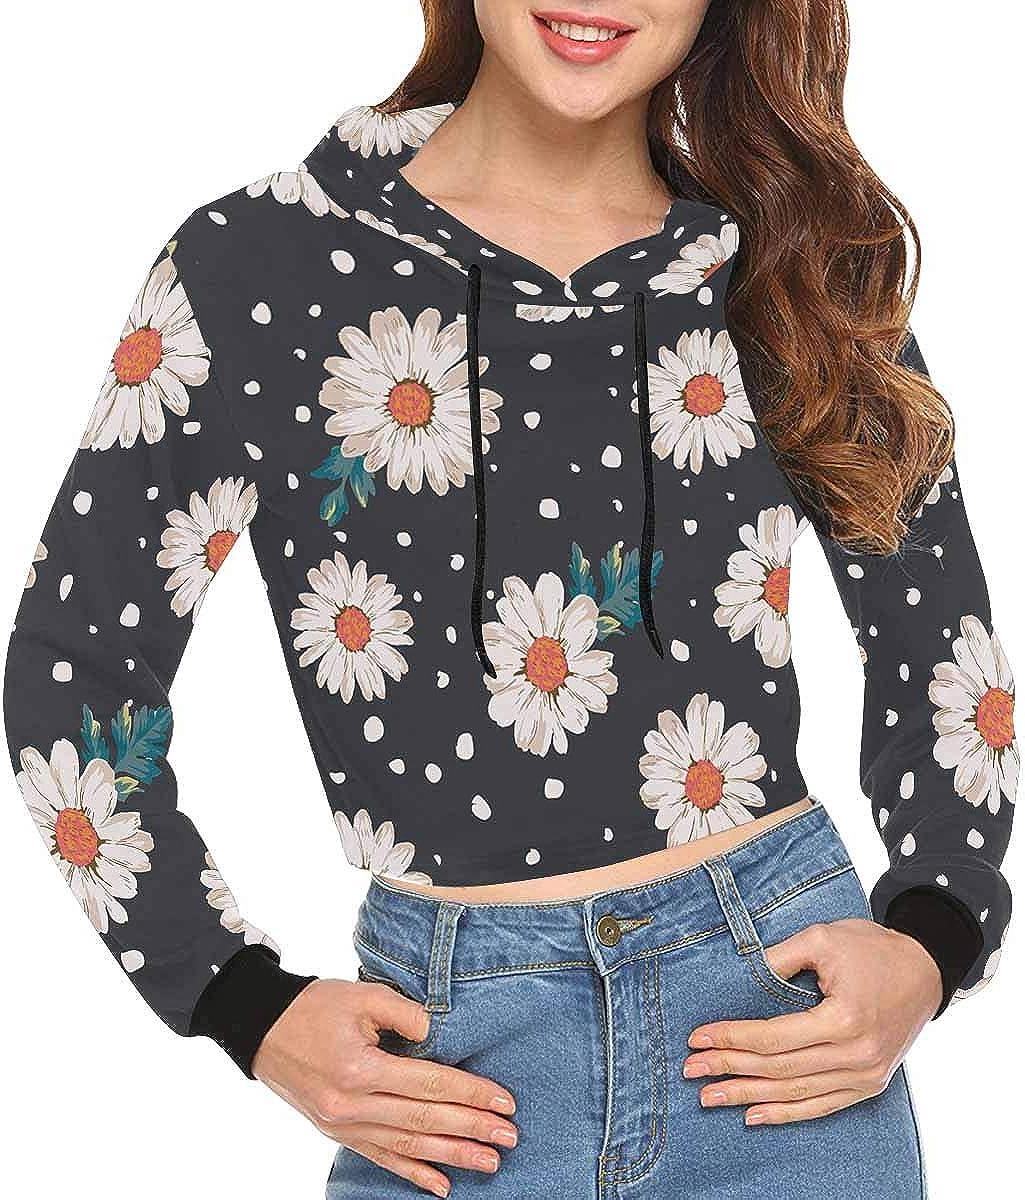 INTERESTPRINT Womens Casual Hoodies Sweatshirt Long Sleeve Crop Tops Pullover Top XS~2XL